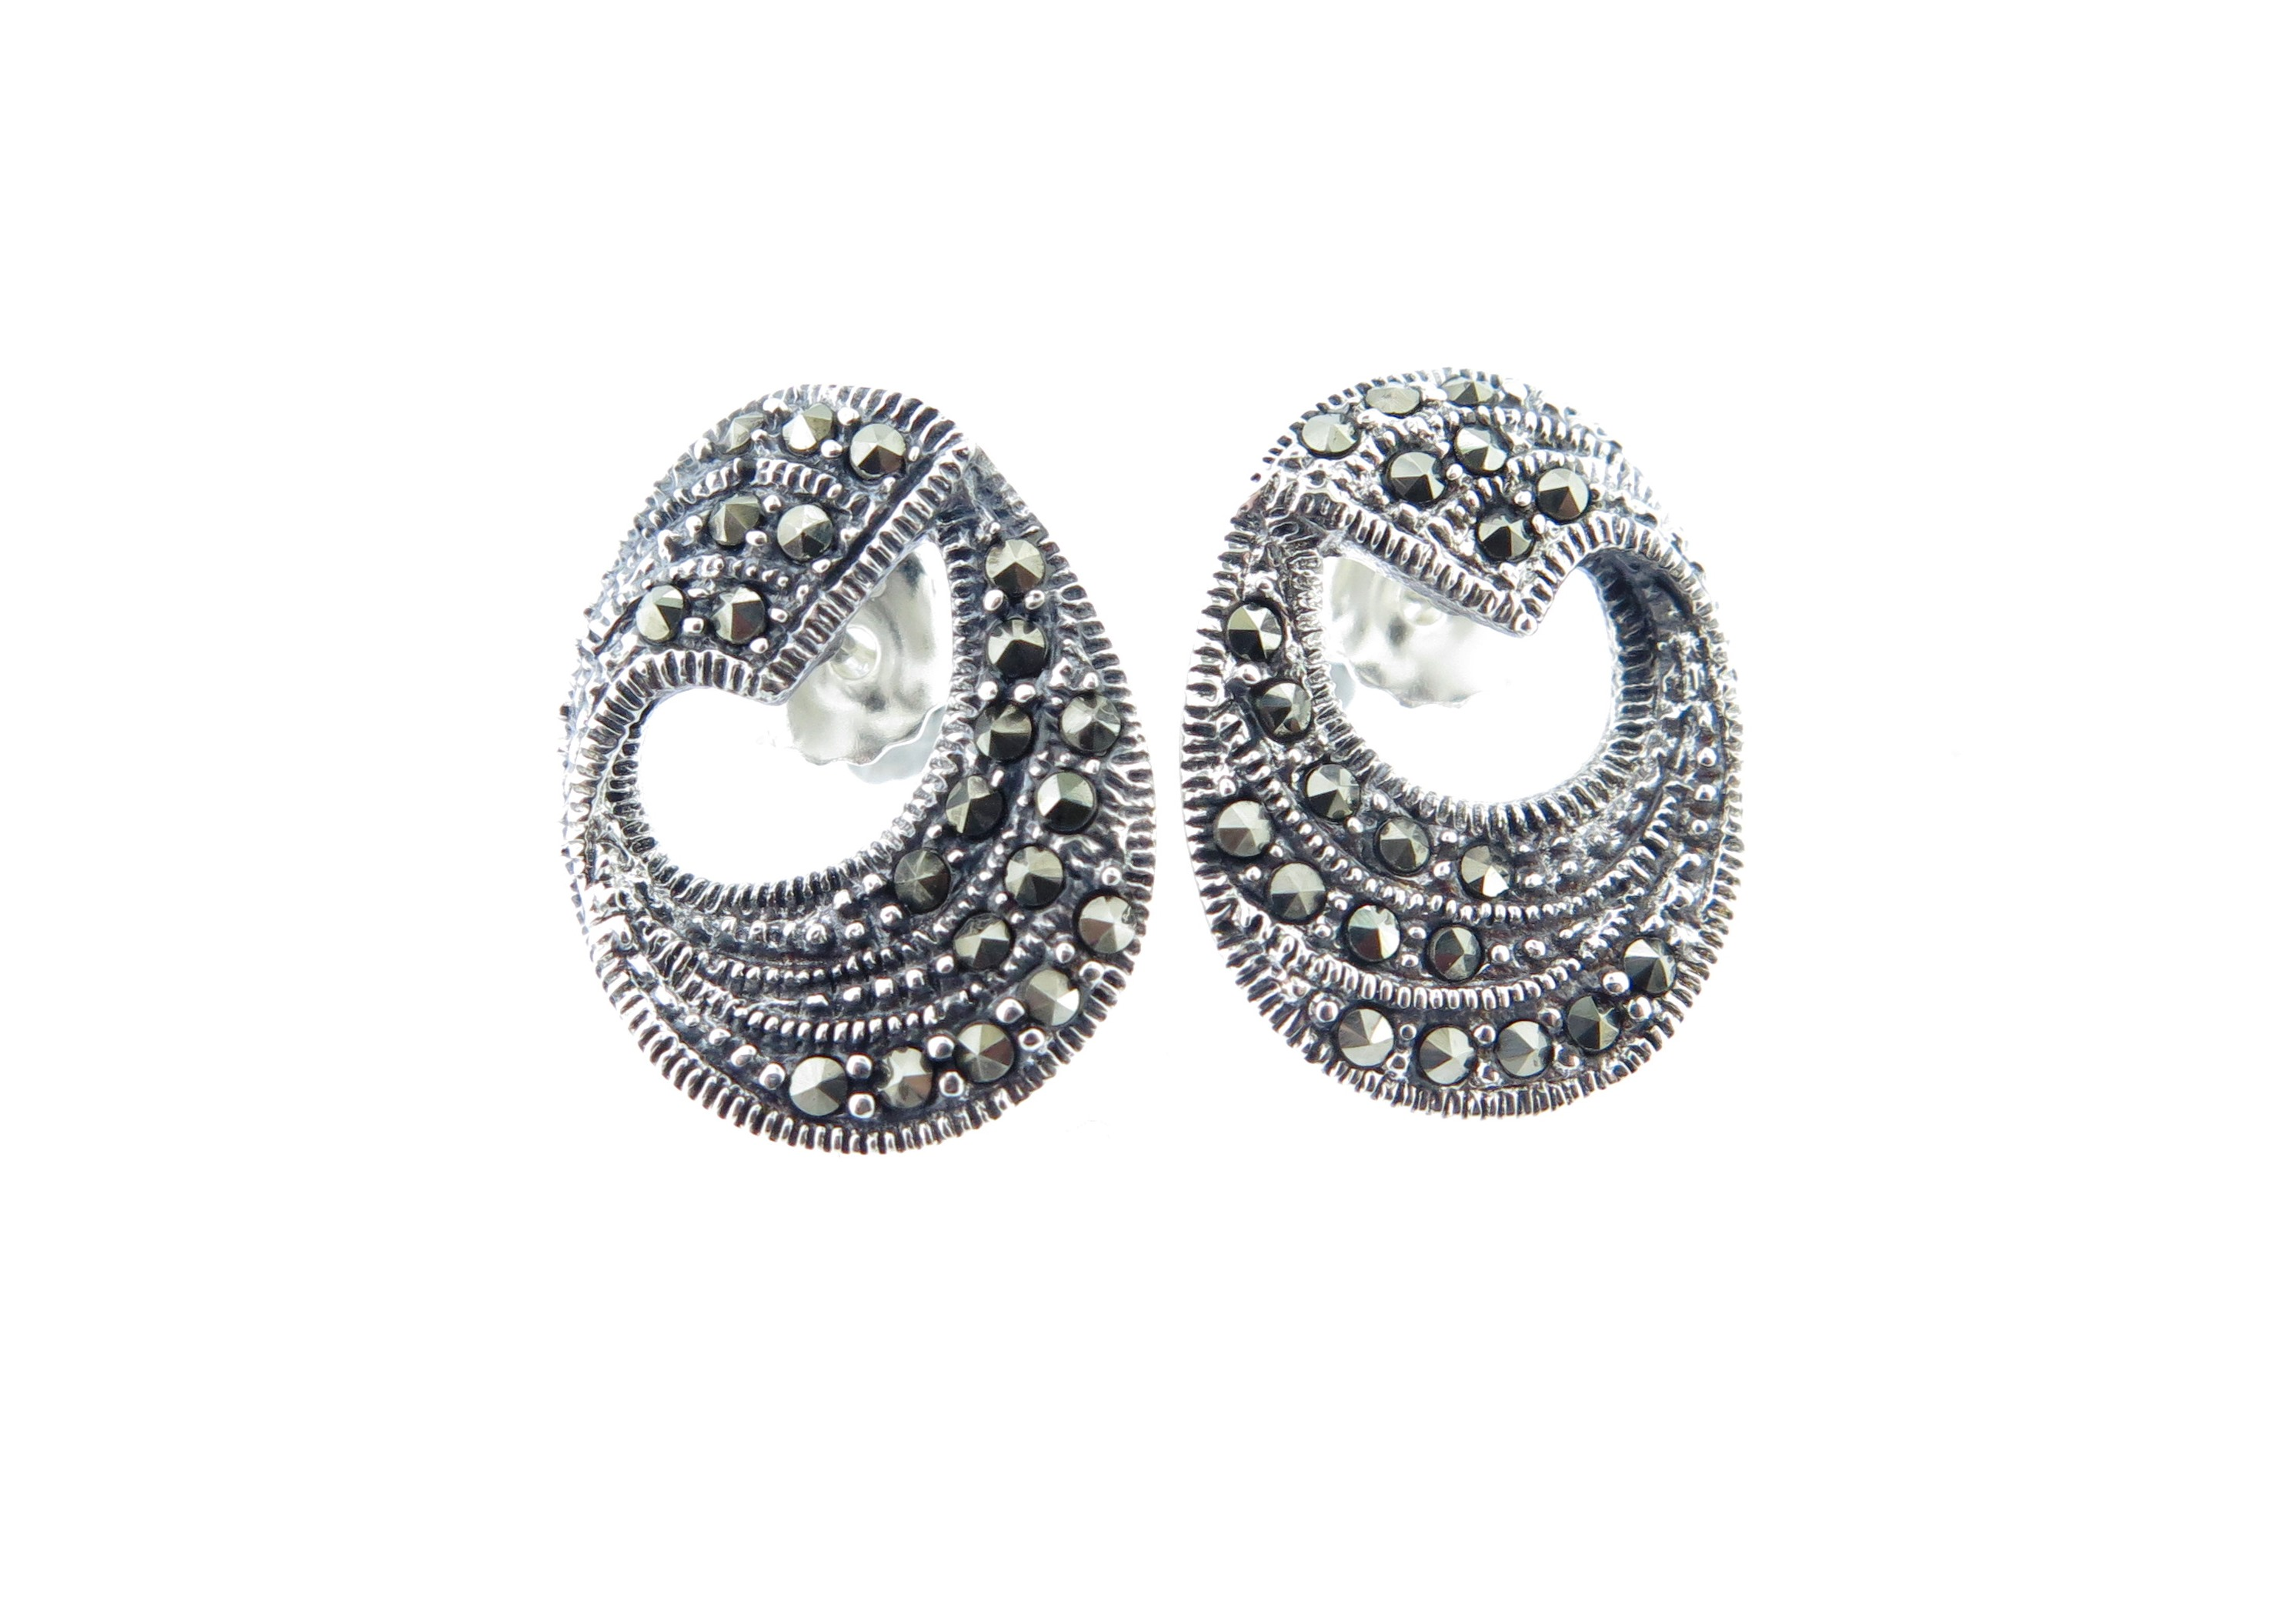 Marcasite Stud Earrings MJ14179